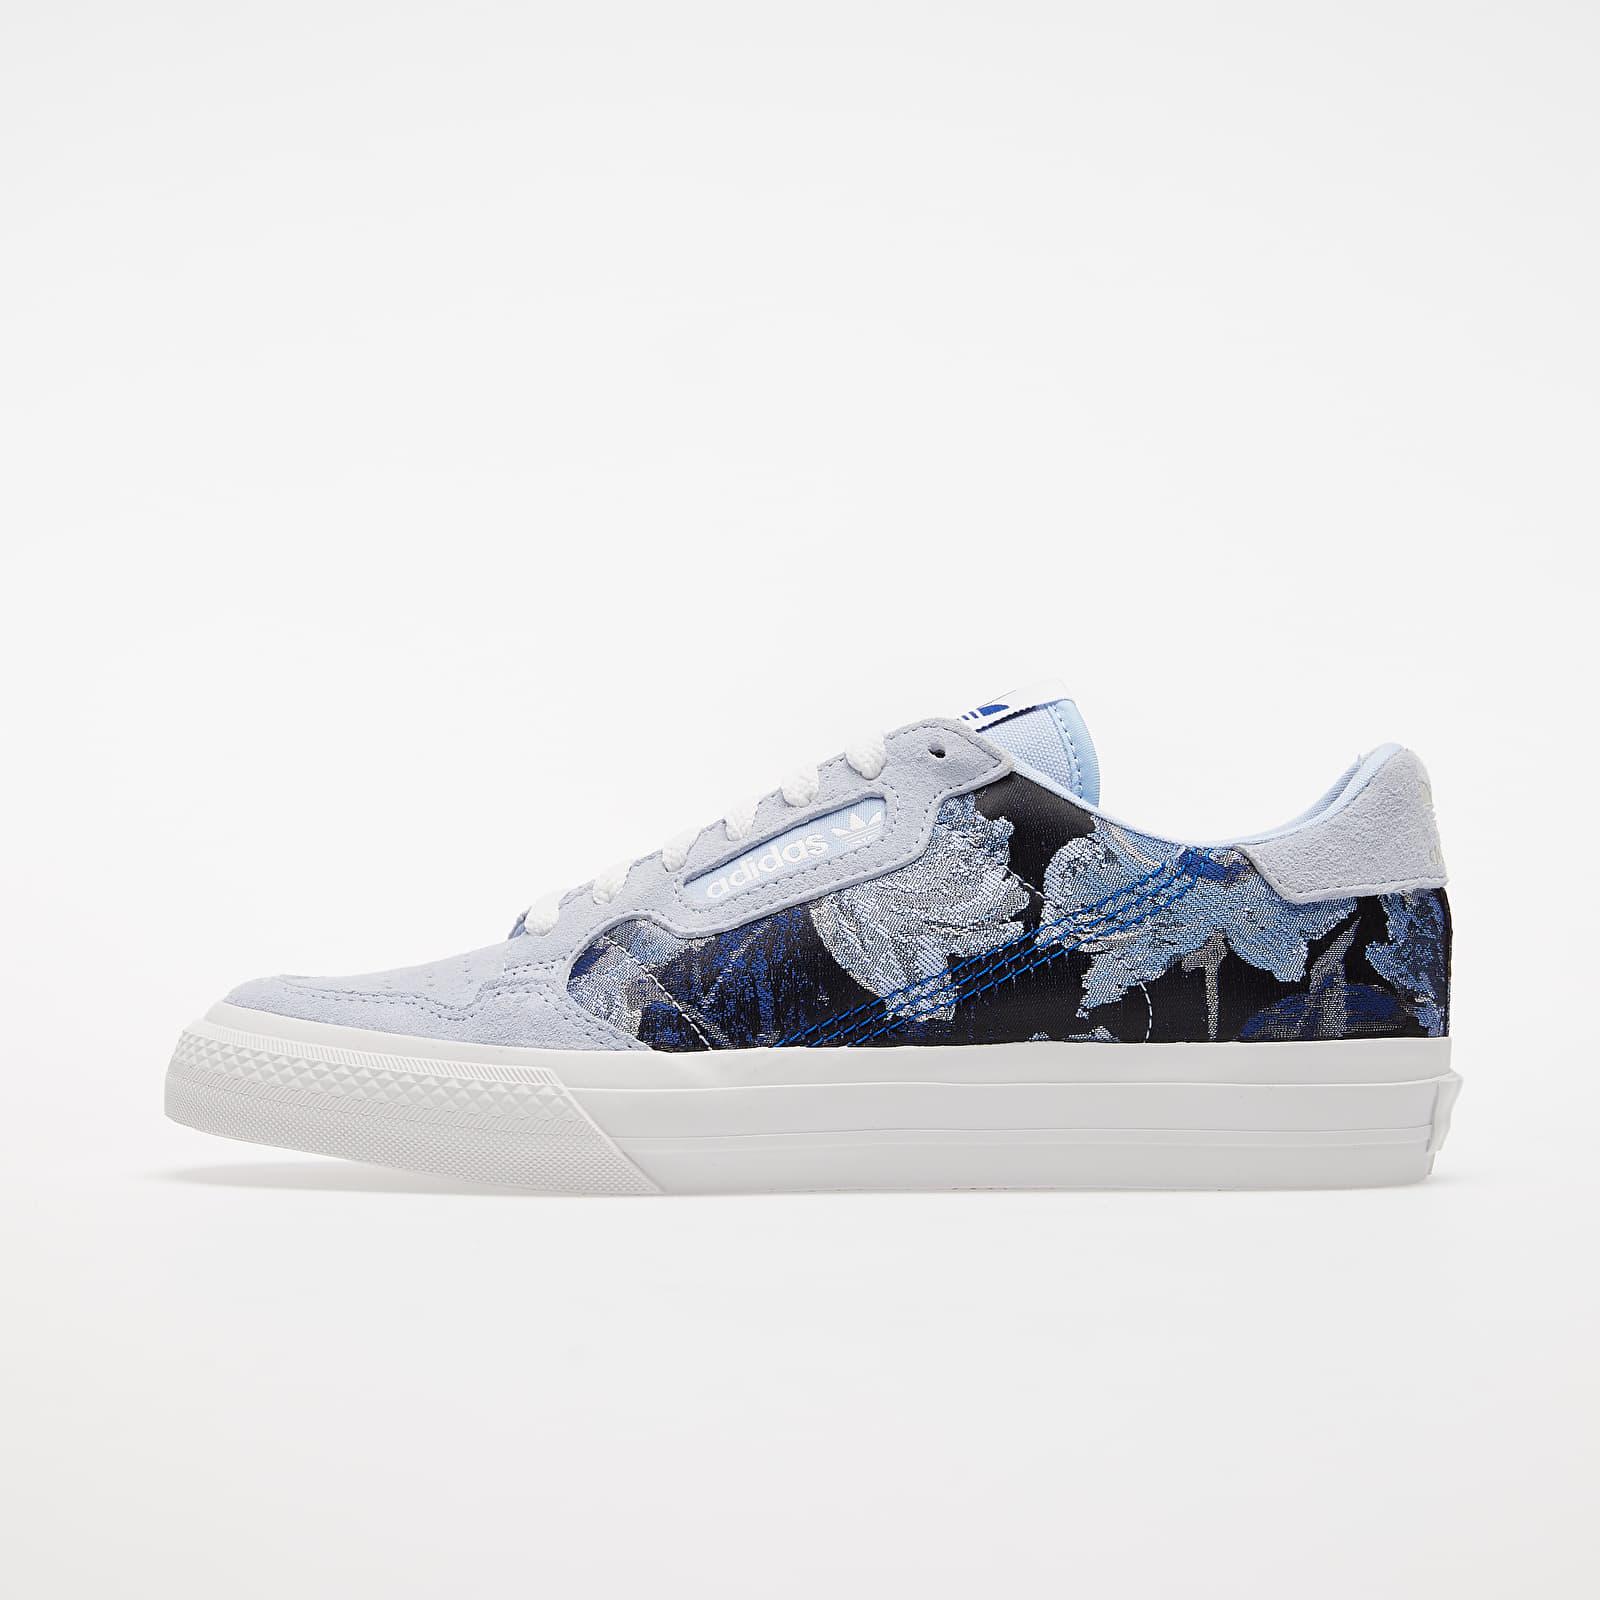 Scarpe e sneaker da donna adidas Continental Vulc W Periwinkle/ Crystal White/ Royal Blue